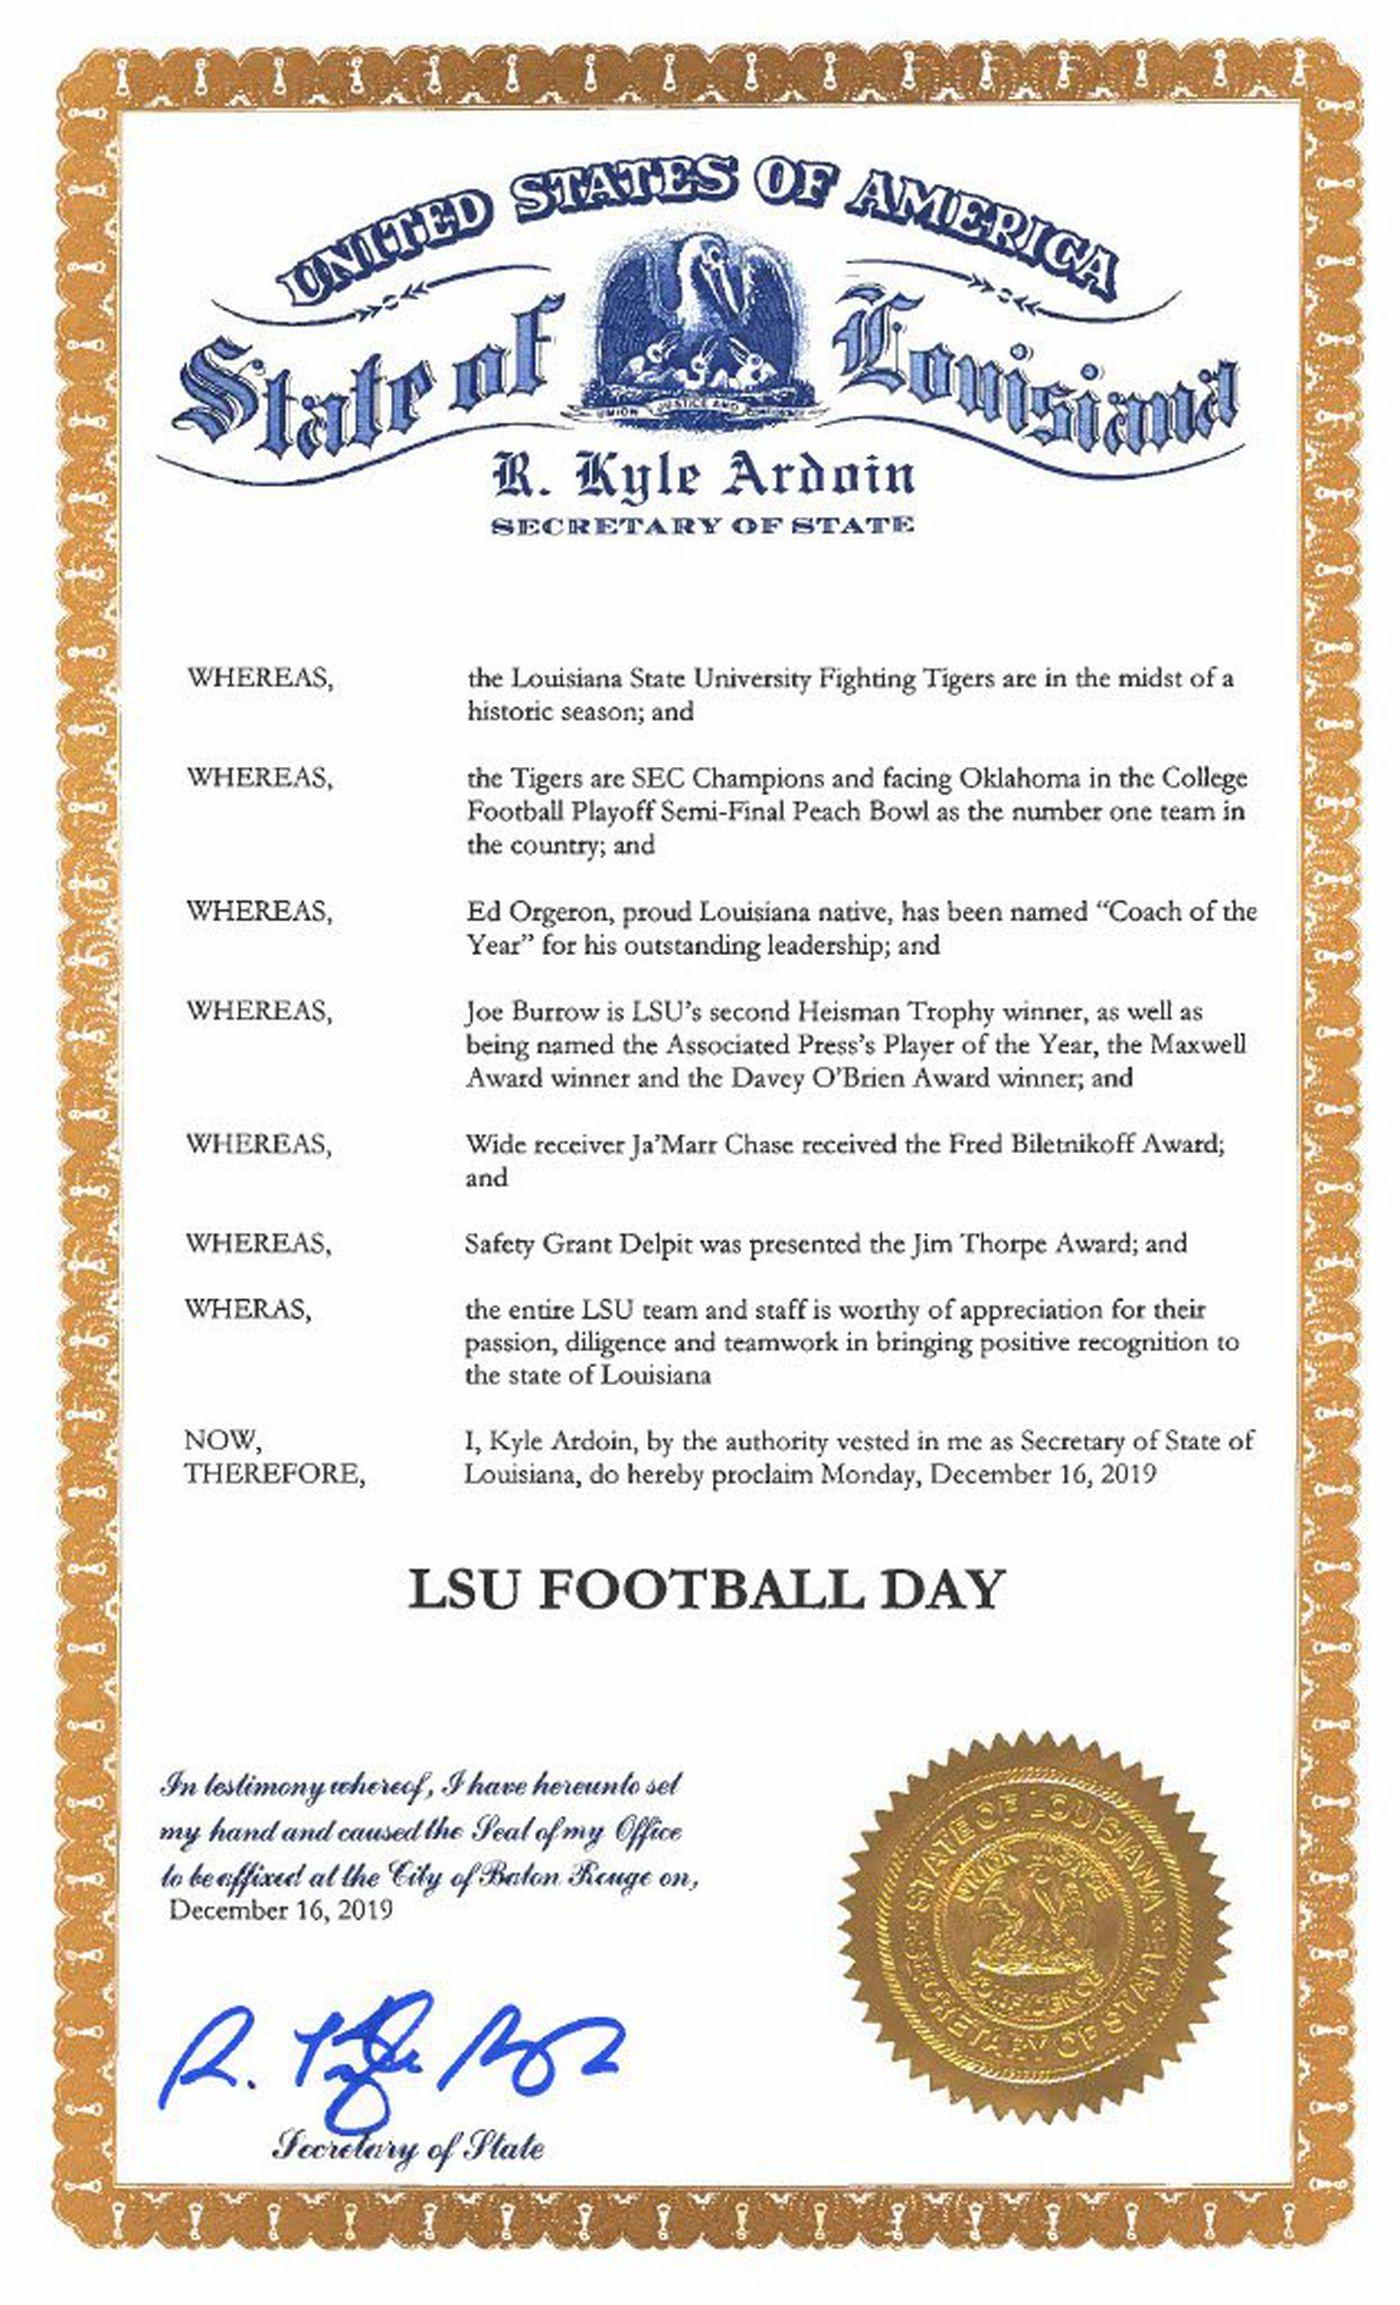 LSU Football Day